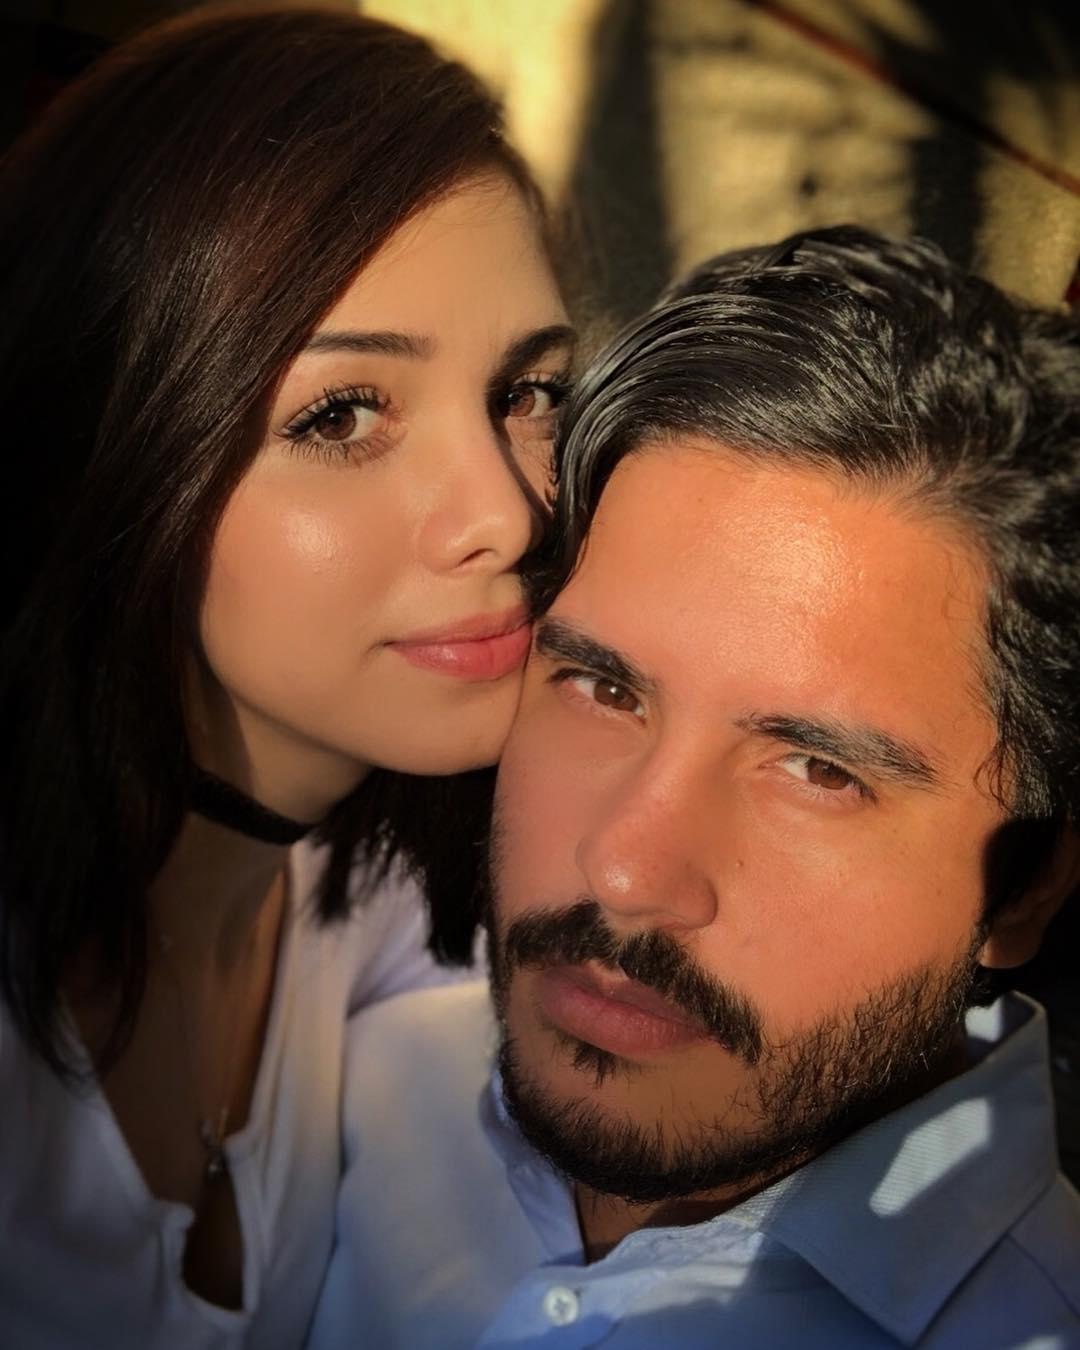 maira alexandra rodriguez, miss earth-water de miss earth 2014. - Página 30 26067112